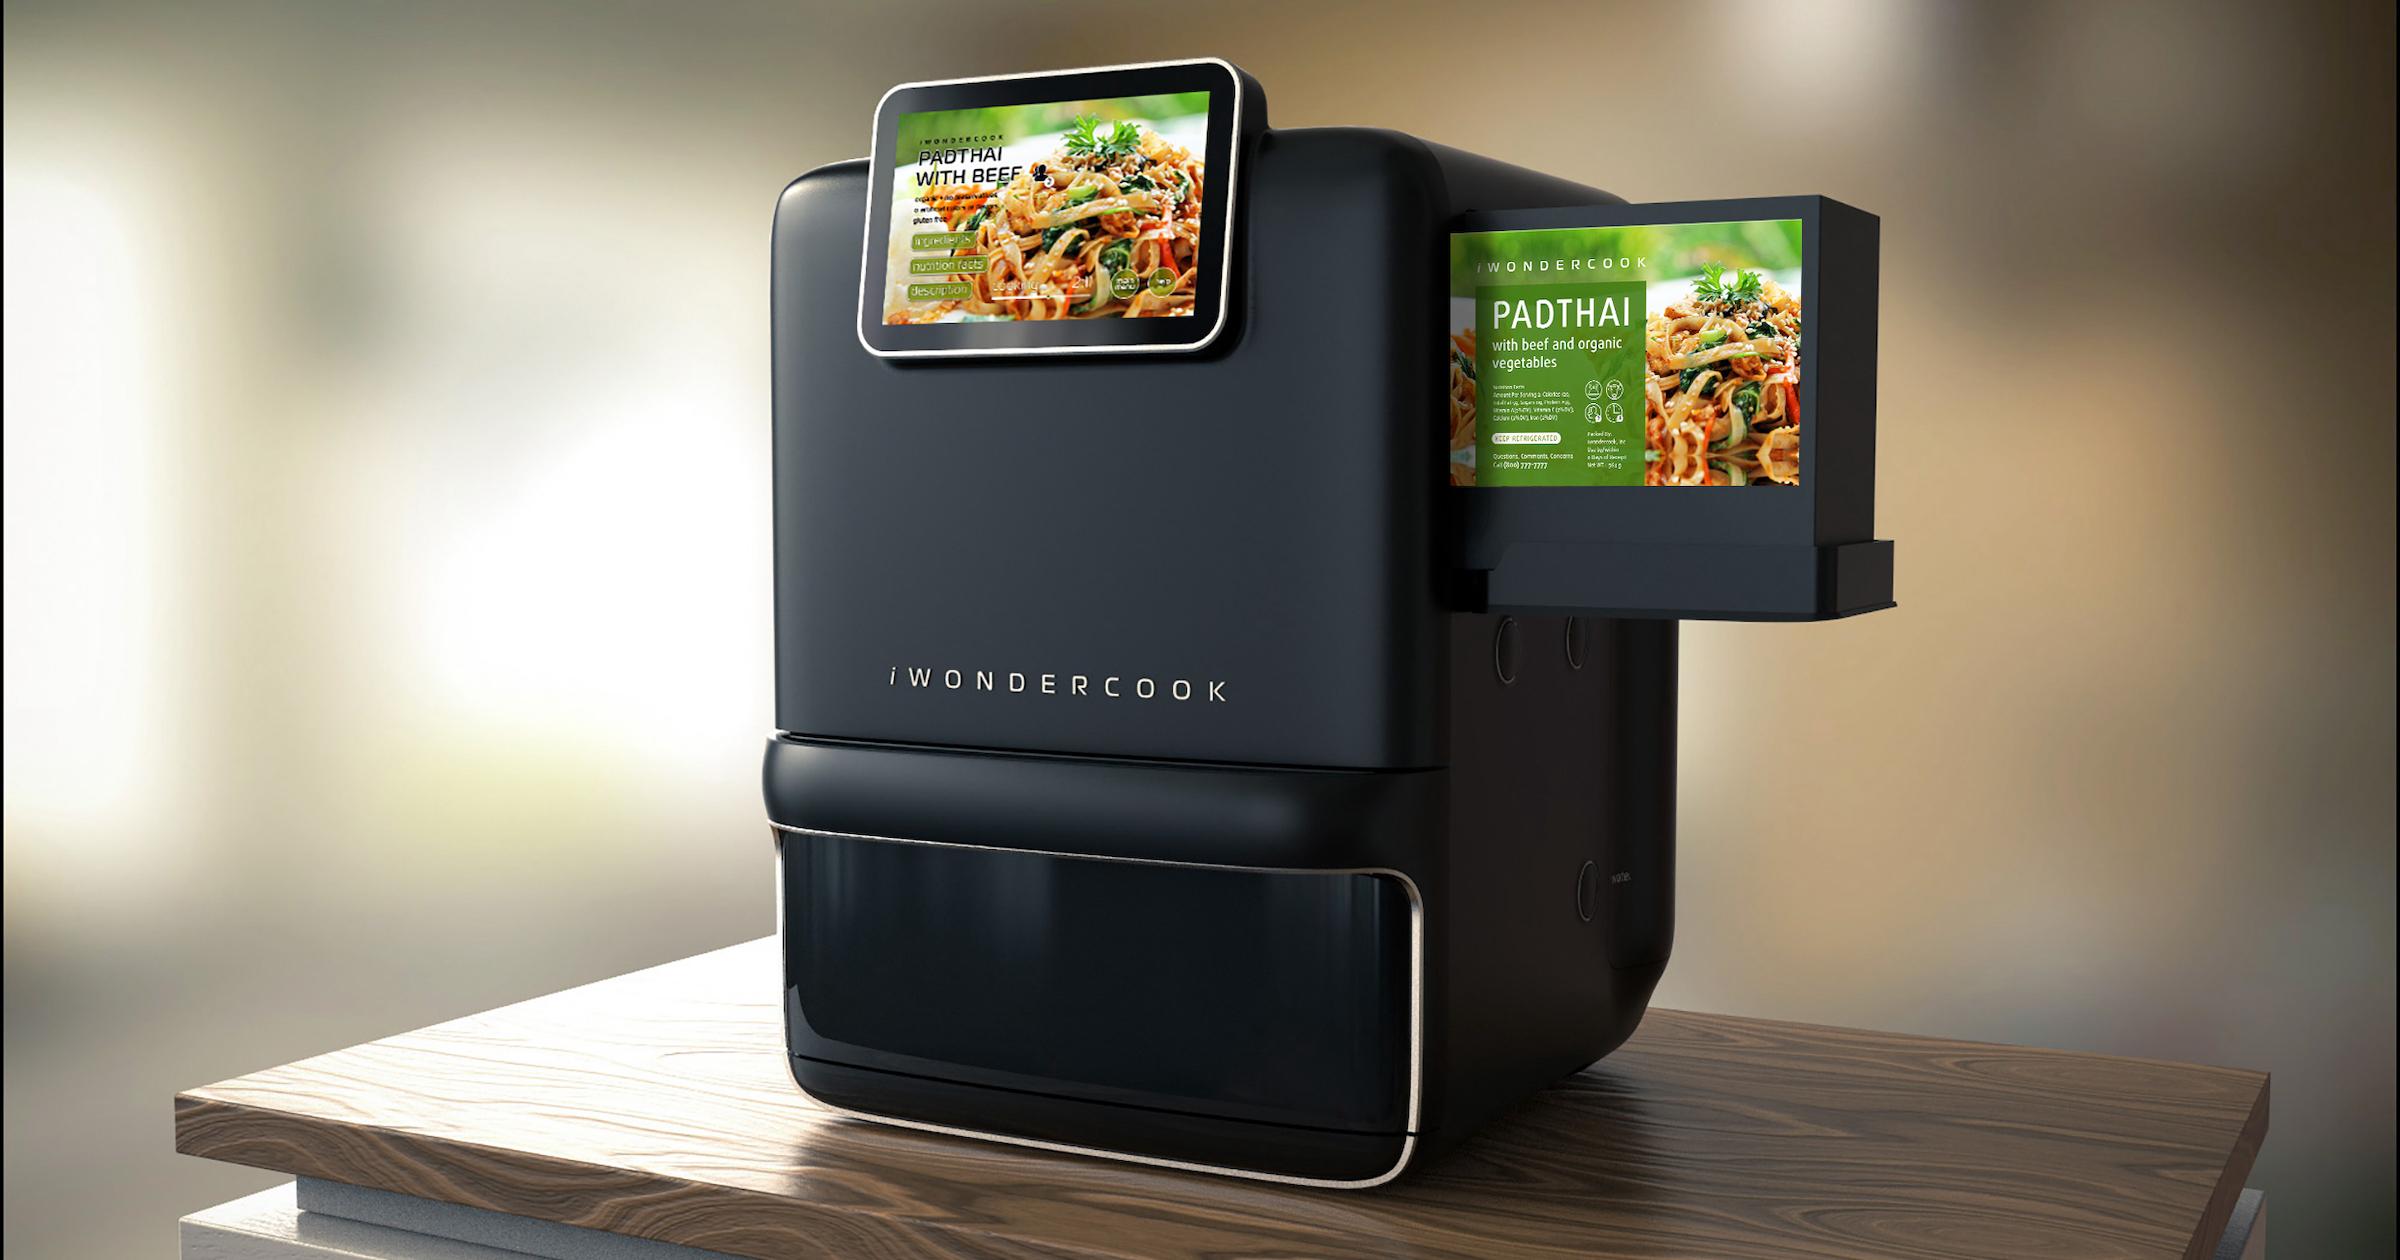 The iWondercook robotic chef